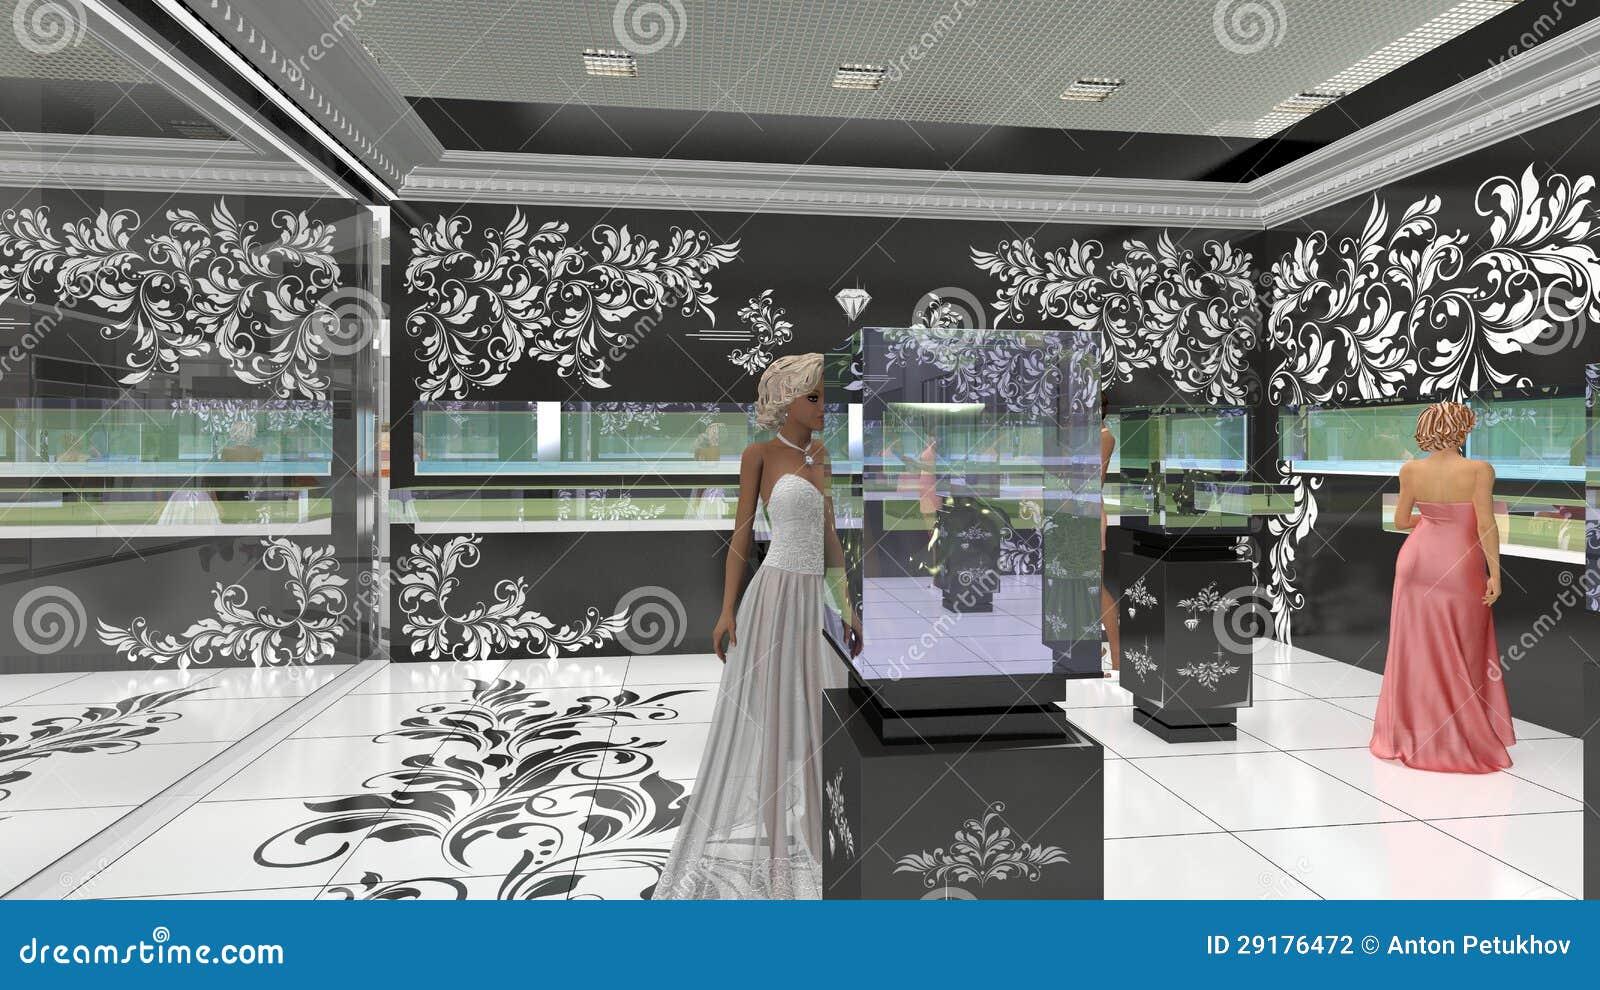 3D illustration of jewelry salon